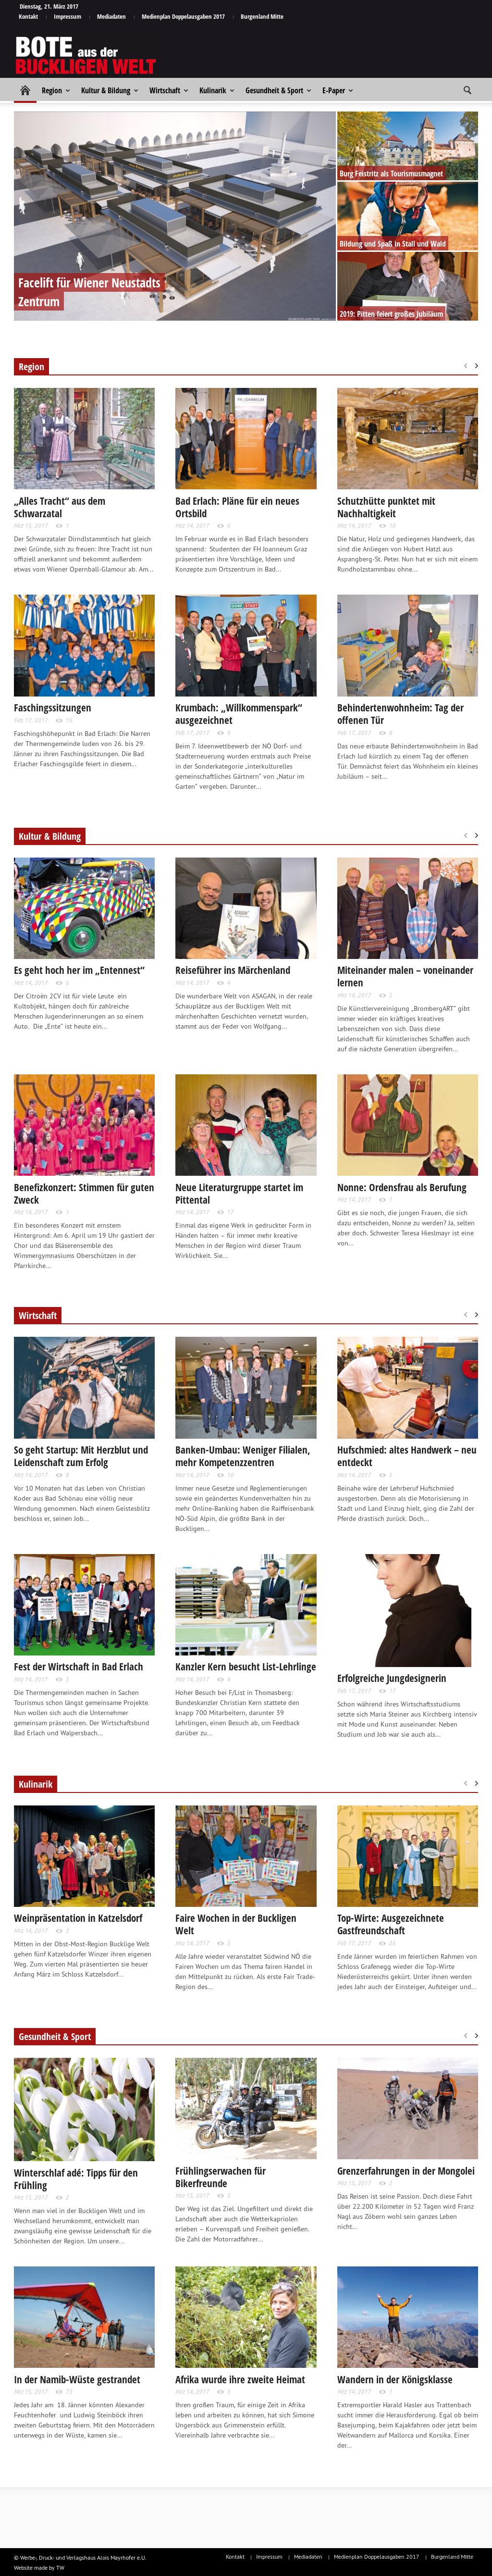 Sexkontakte ahlen. Online partnersuche pitten